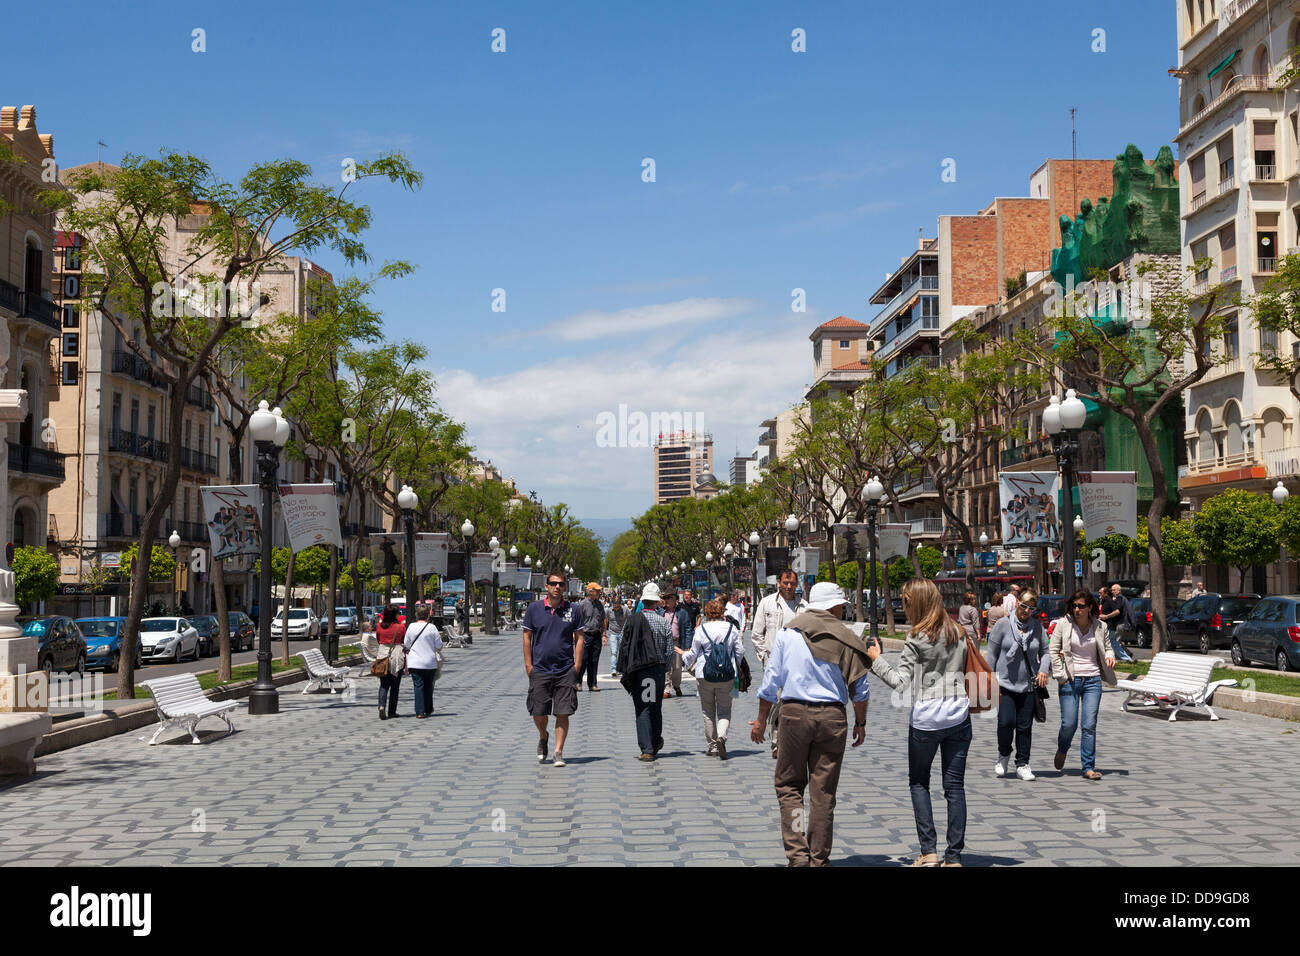 Tarragona Rambla Nova tourist street - Stock Image